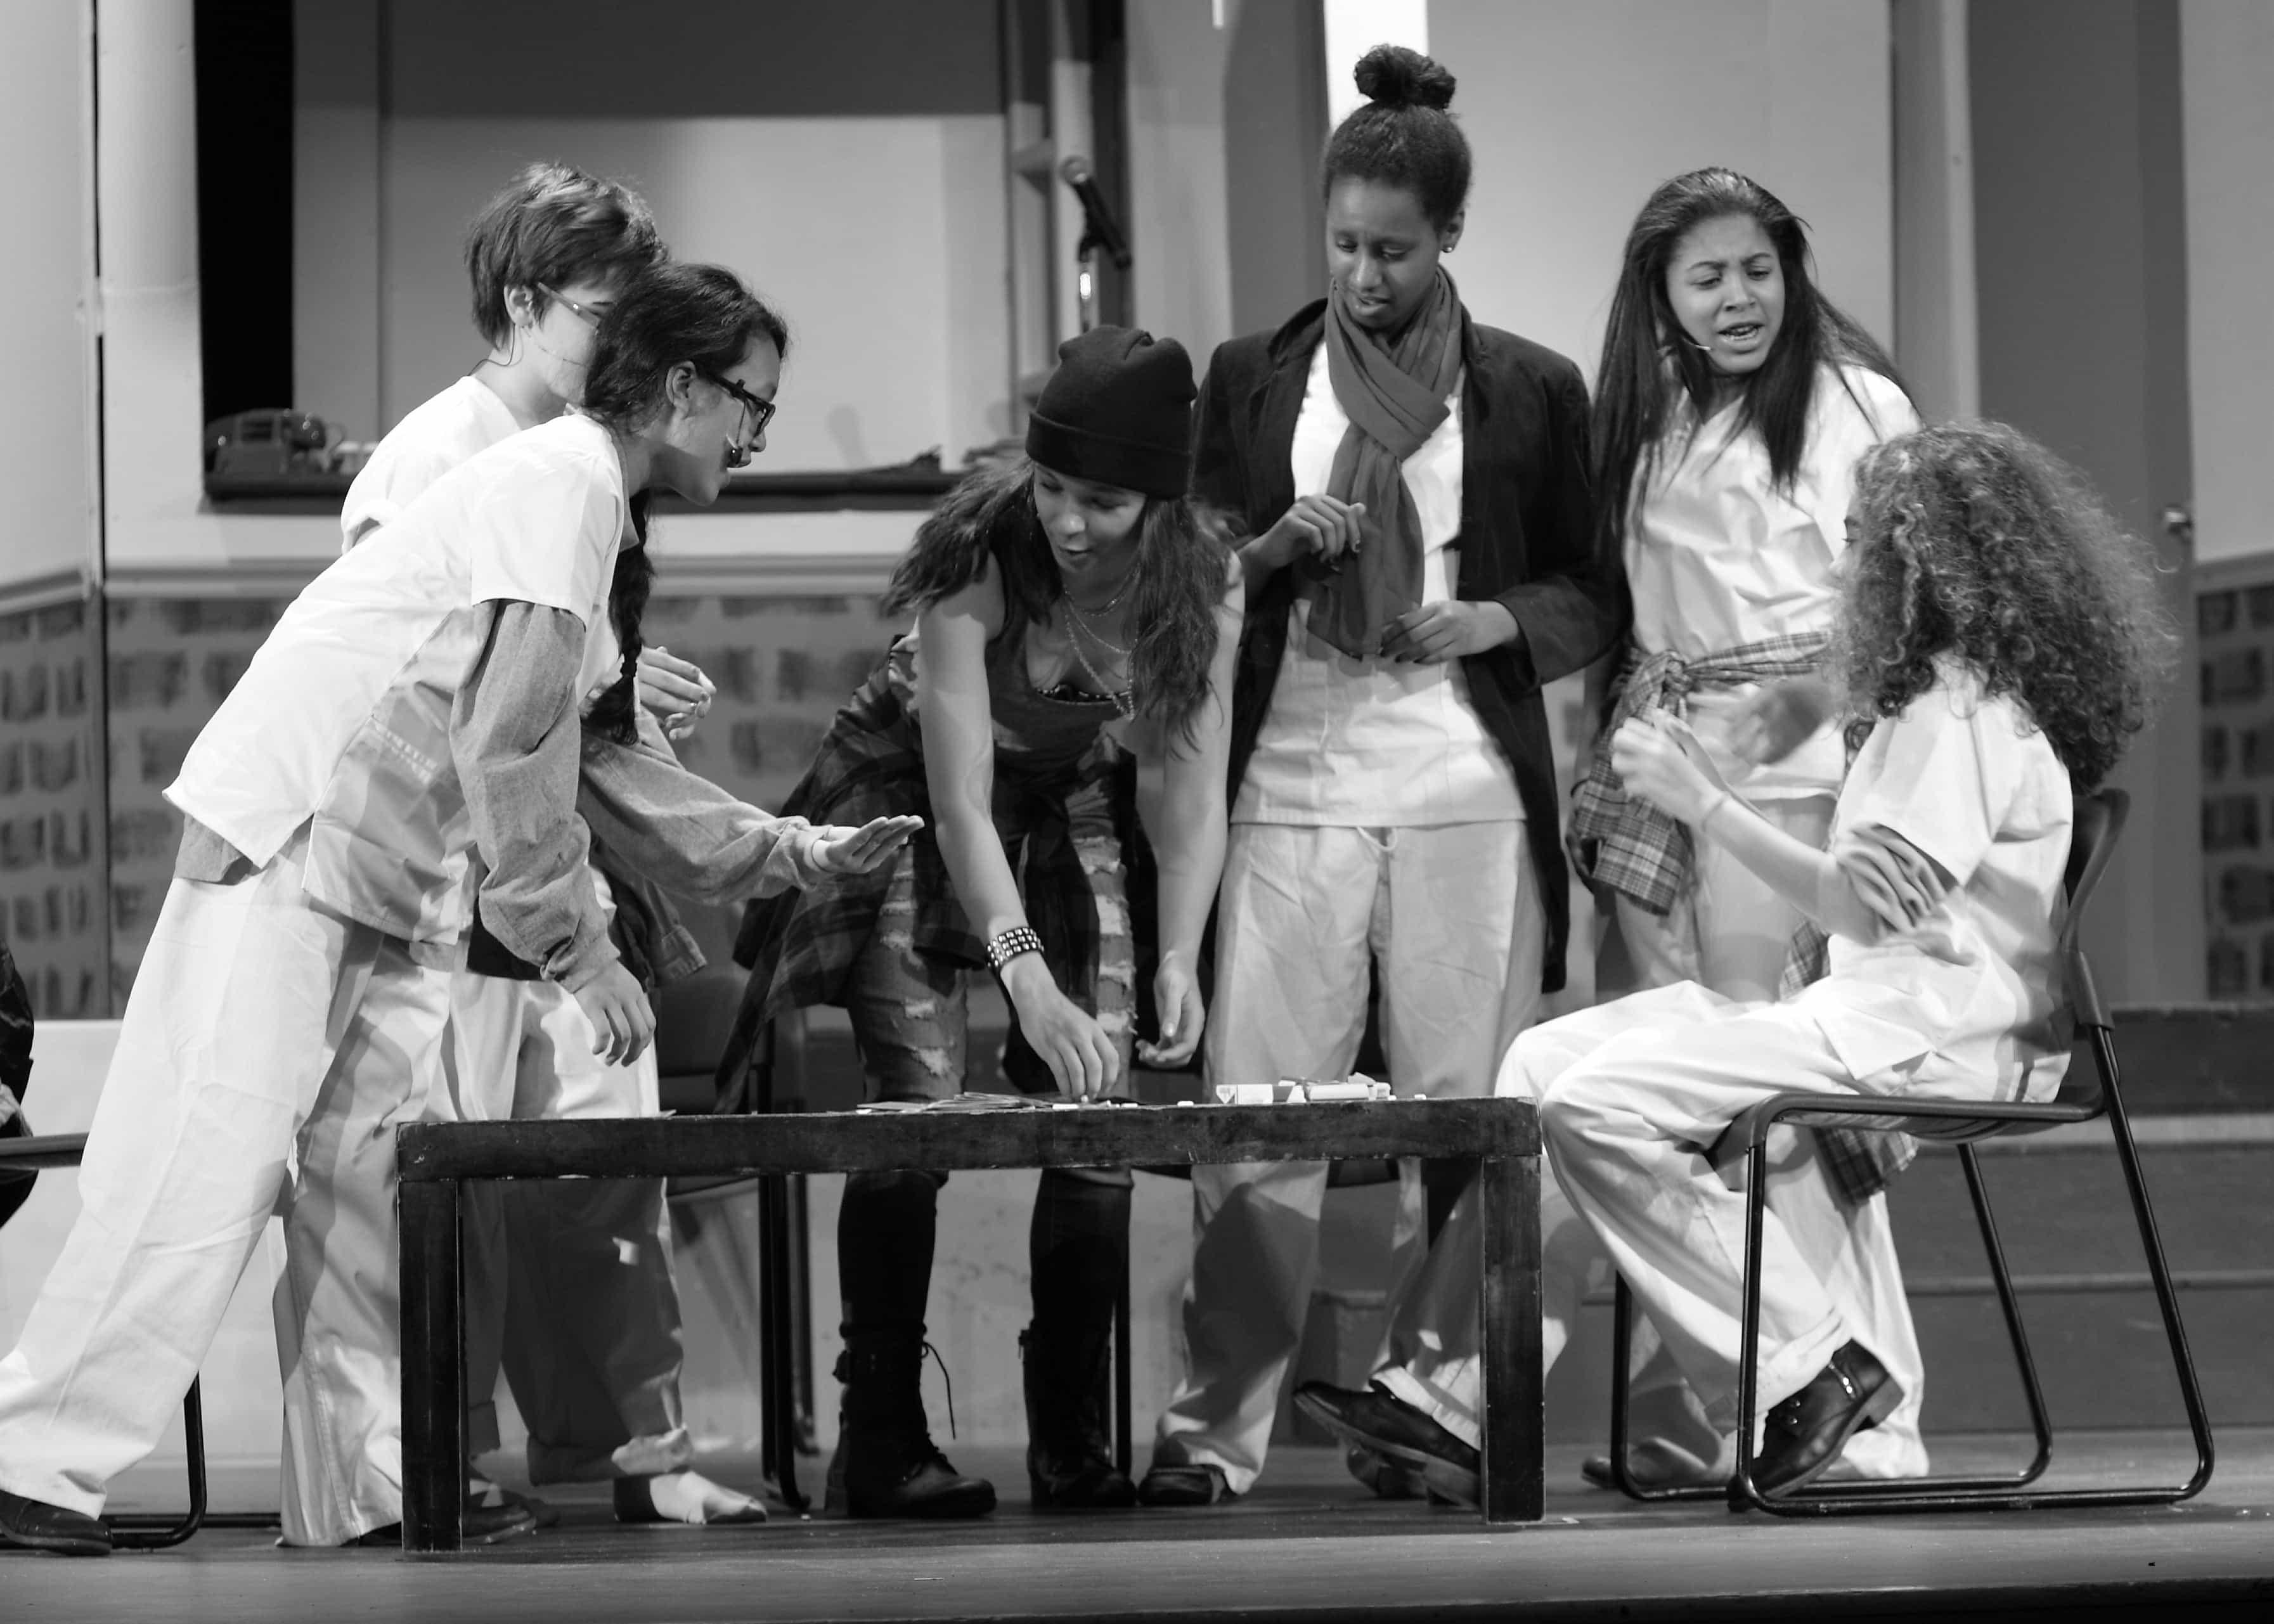 (L to R) Phanida Langer (Bobby), Kiana Burch (Martini), Ellie Milewski(McMurphy), Bethel Elias (Harding), Sydnee Prayor (Scanlon), and Miriam Barsoum (Cheswick). Photo by John Milewski